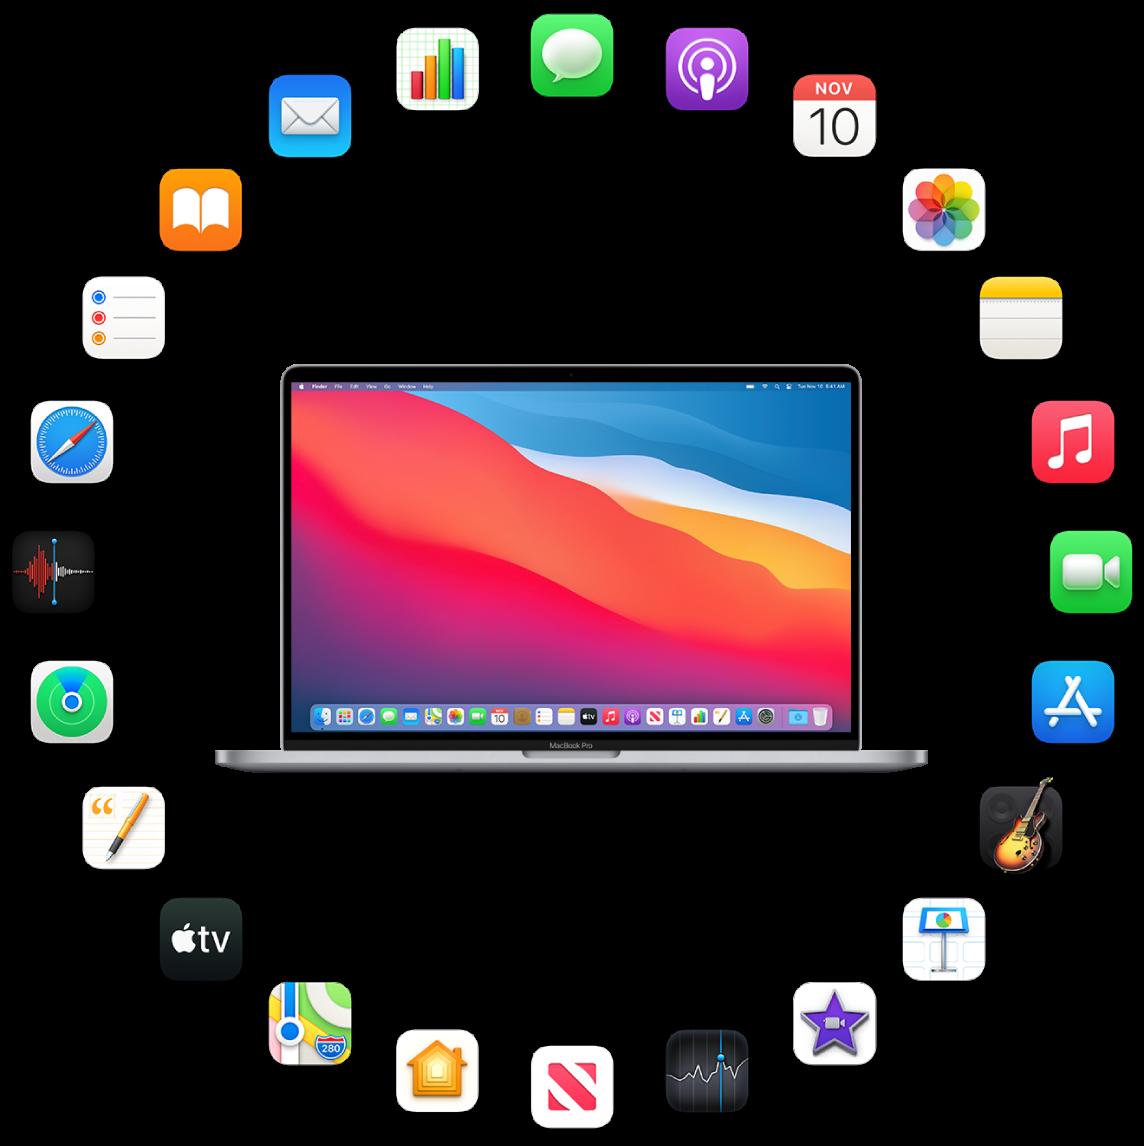 MacBookPro מוקף בצלמיות של היישומים המובנים בו ומתוארים בסעיפים הבאים.